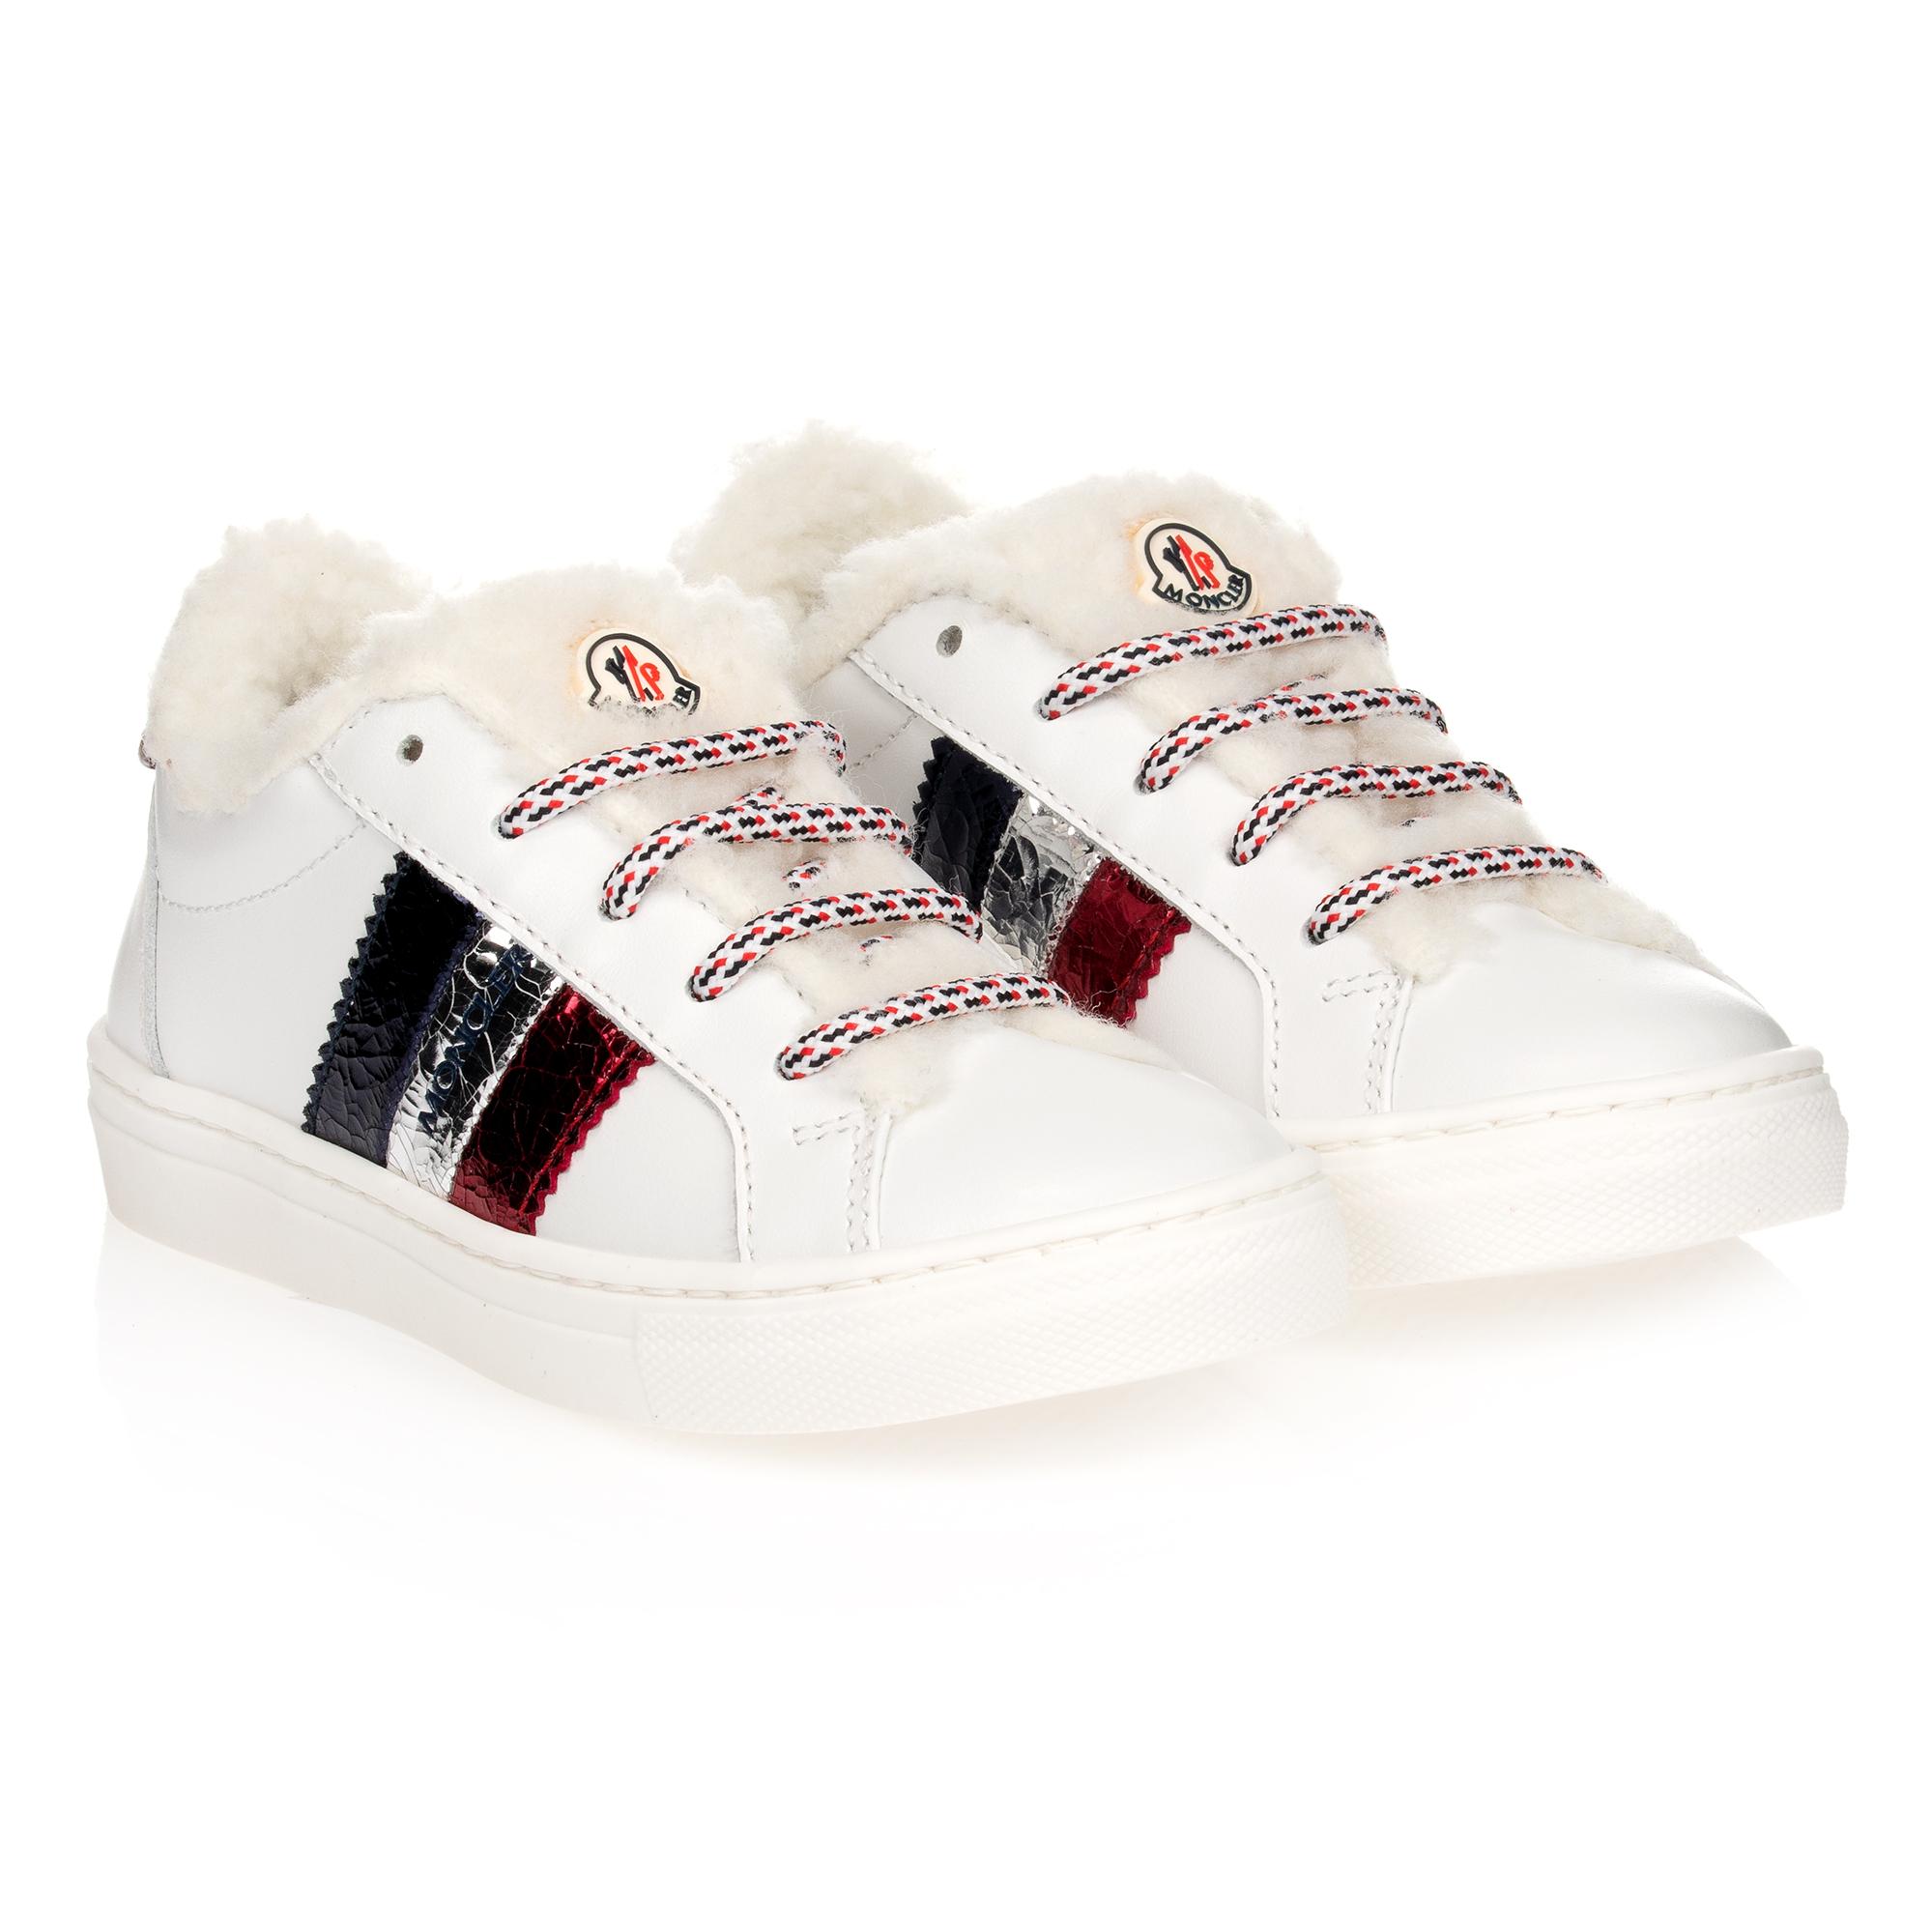 Moncler Enfant - Girls White Leather